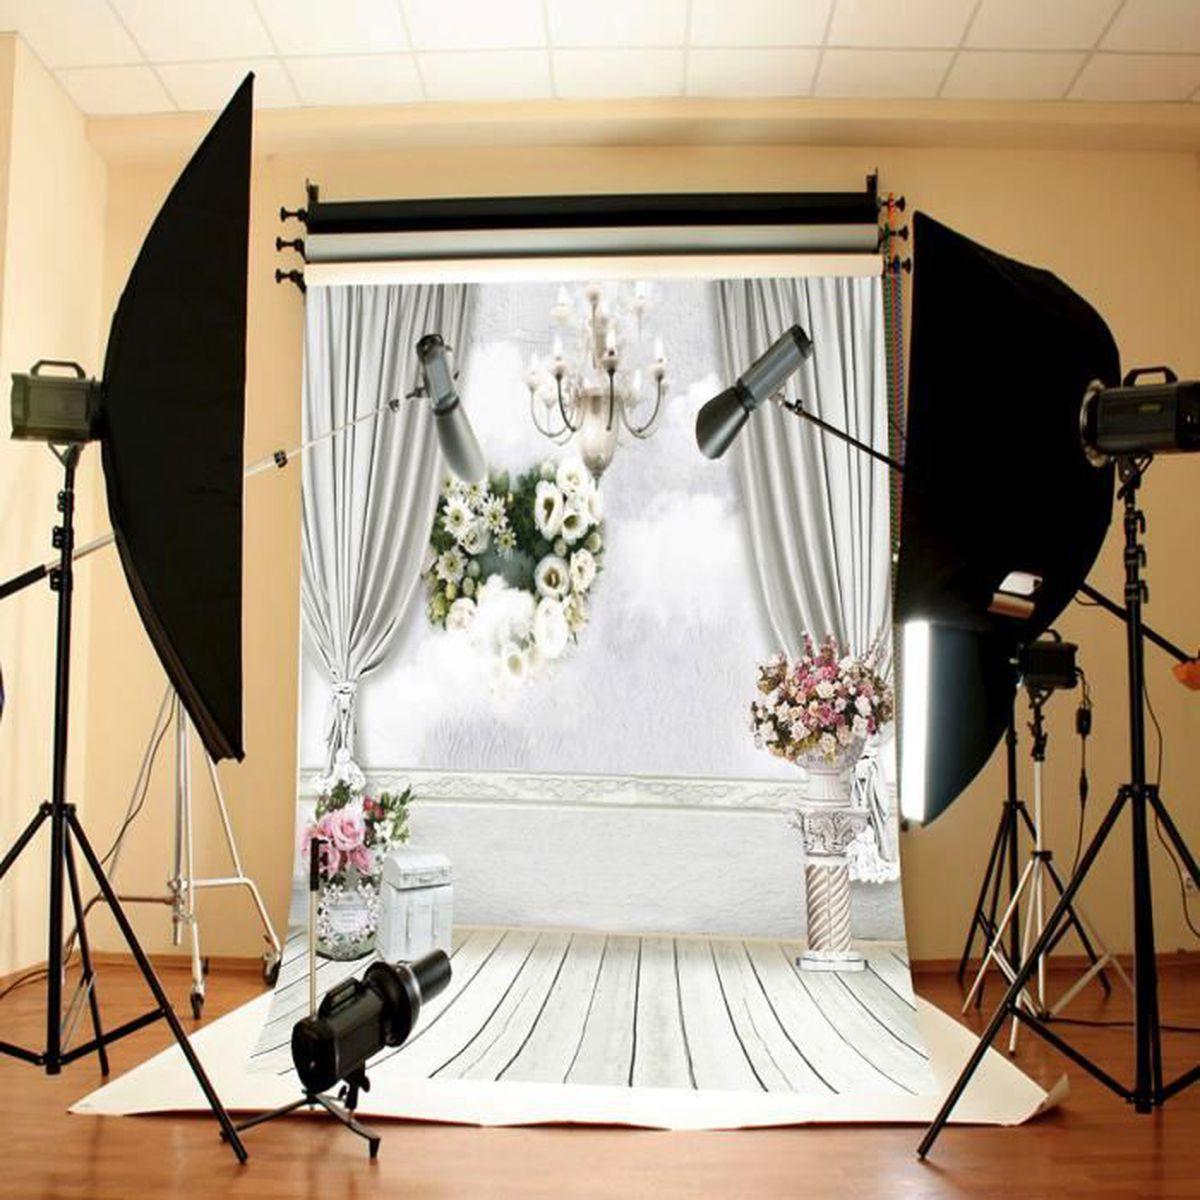 tempsa toile de fond backdrop tissu mariage. Black Bedroom Furniture Sets. Home Design Ideas